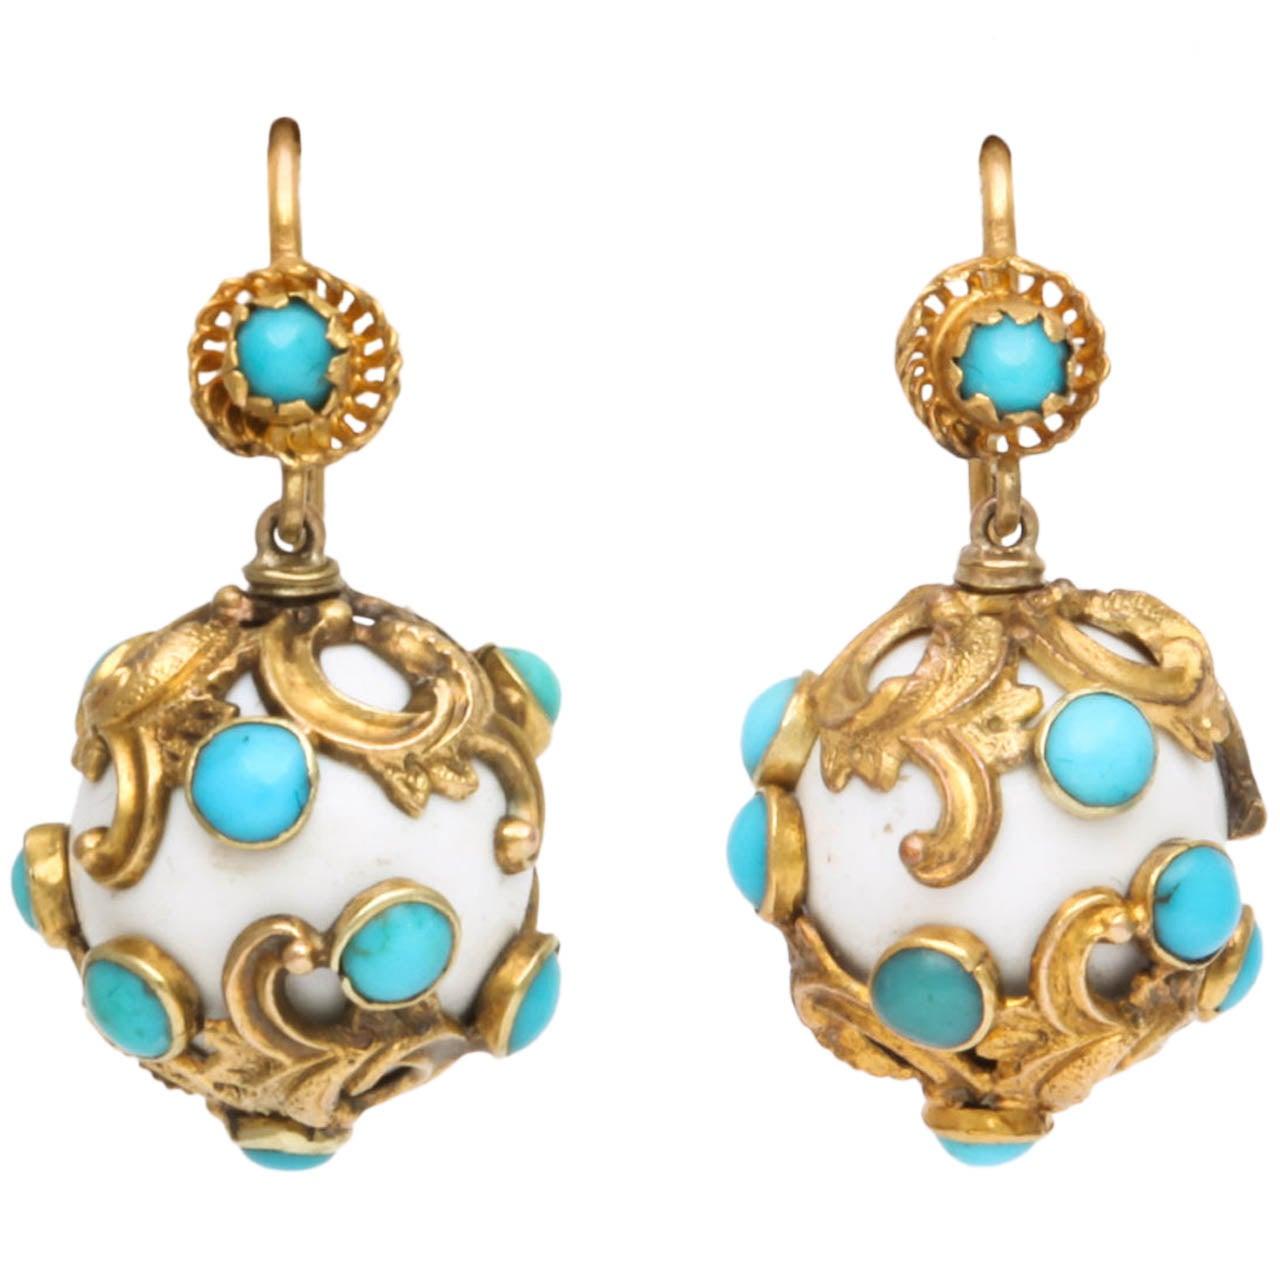 Eternal Summer: Victorian Enamel Turquoise Earrings 1